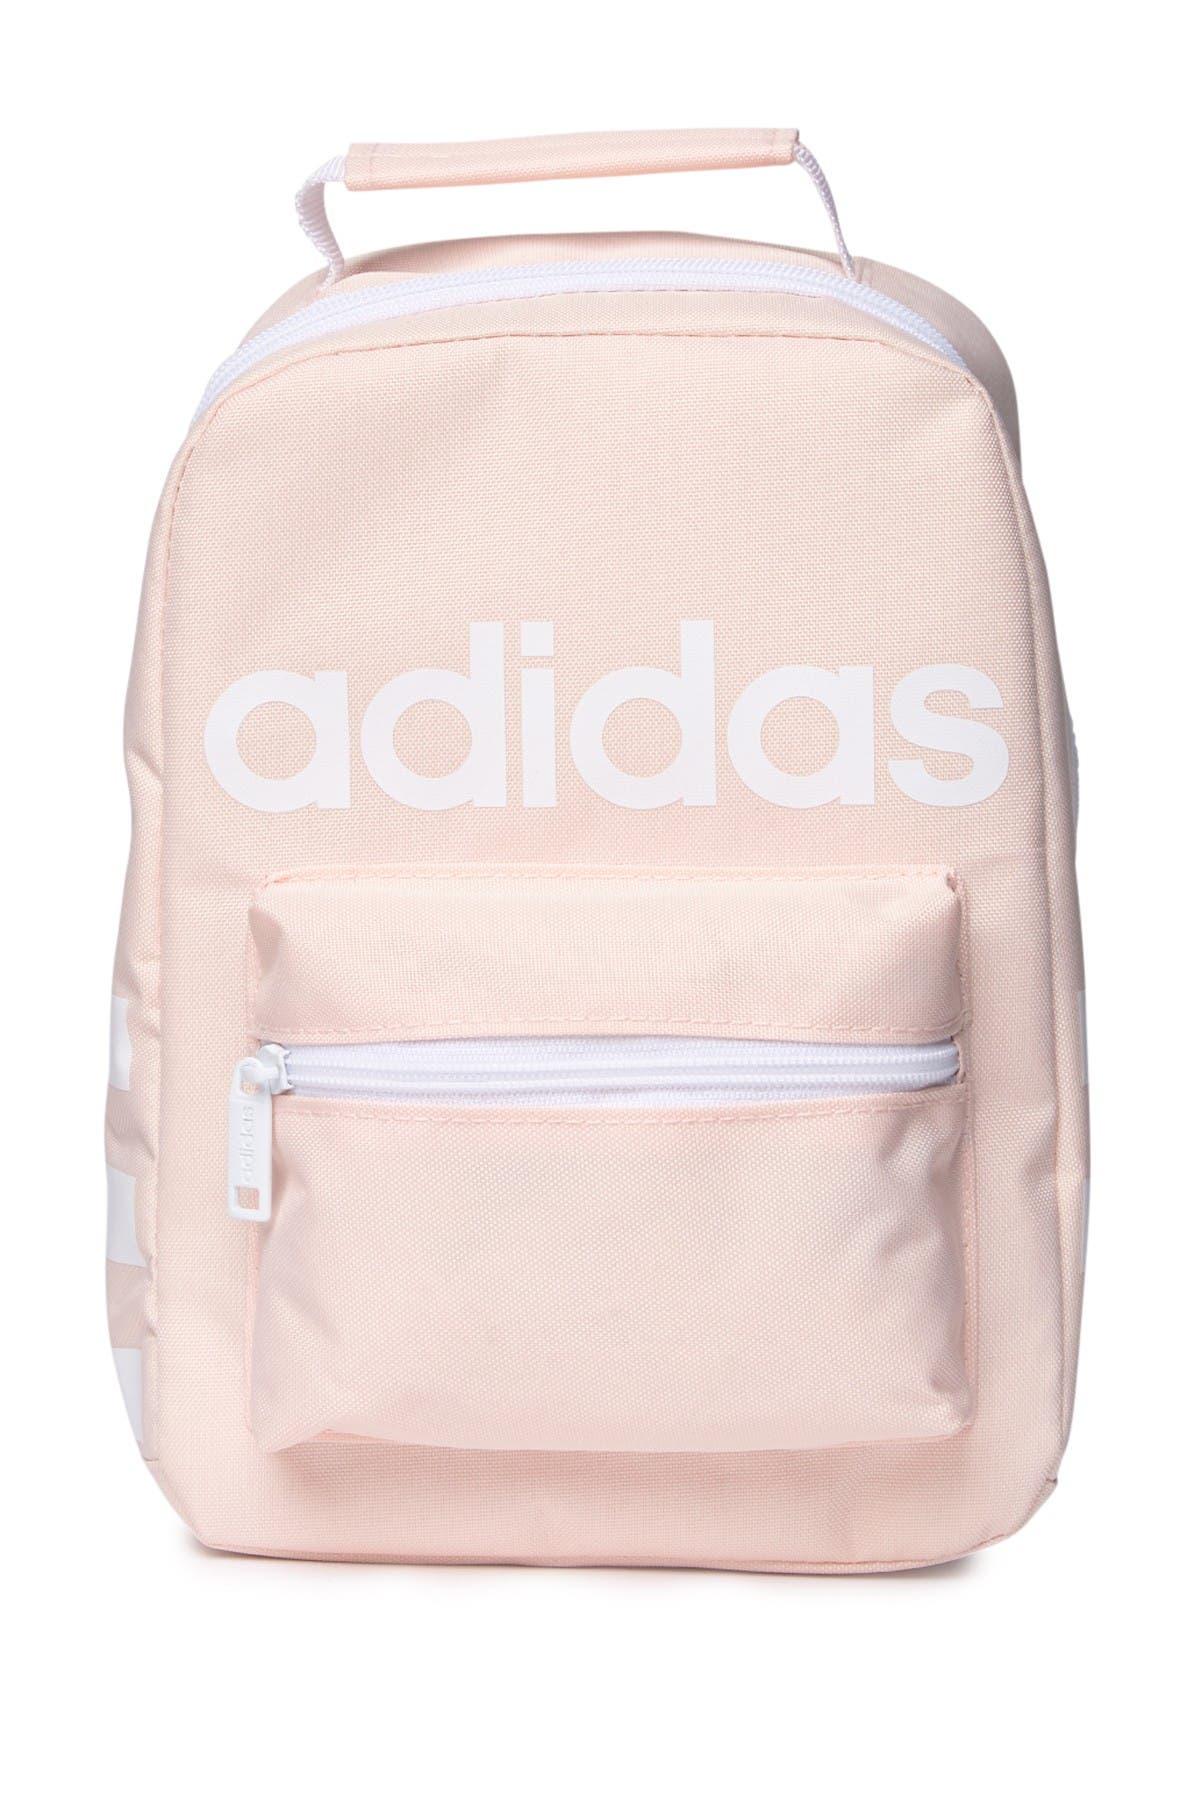 Image of adidas Santiago Lunch Bag